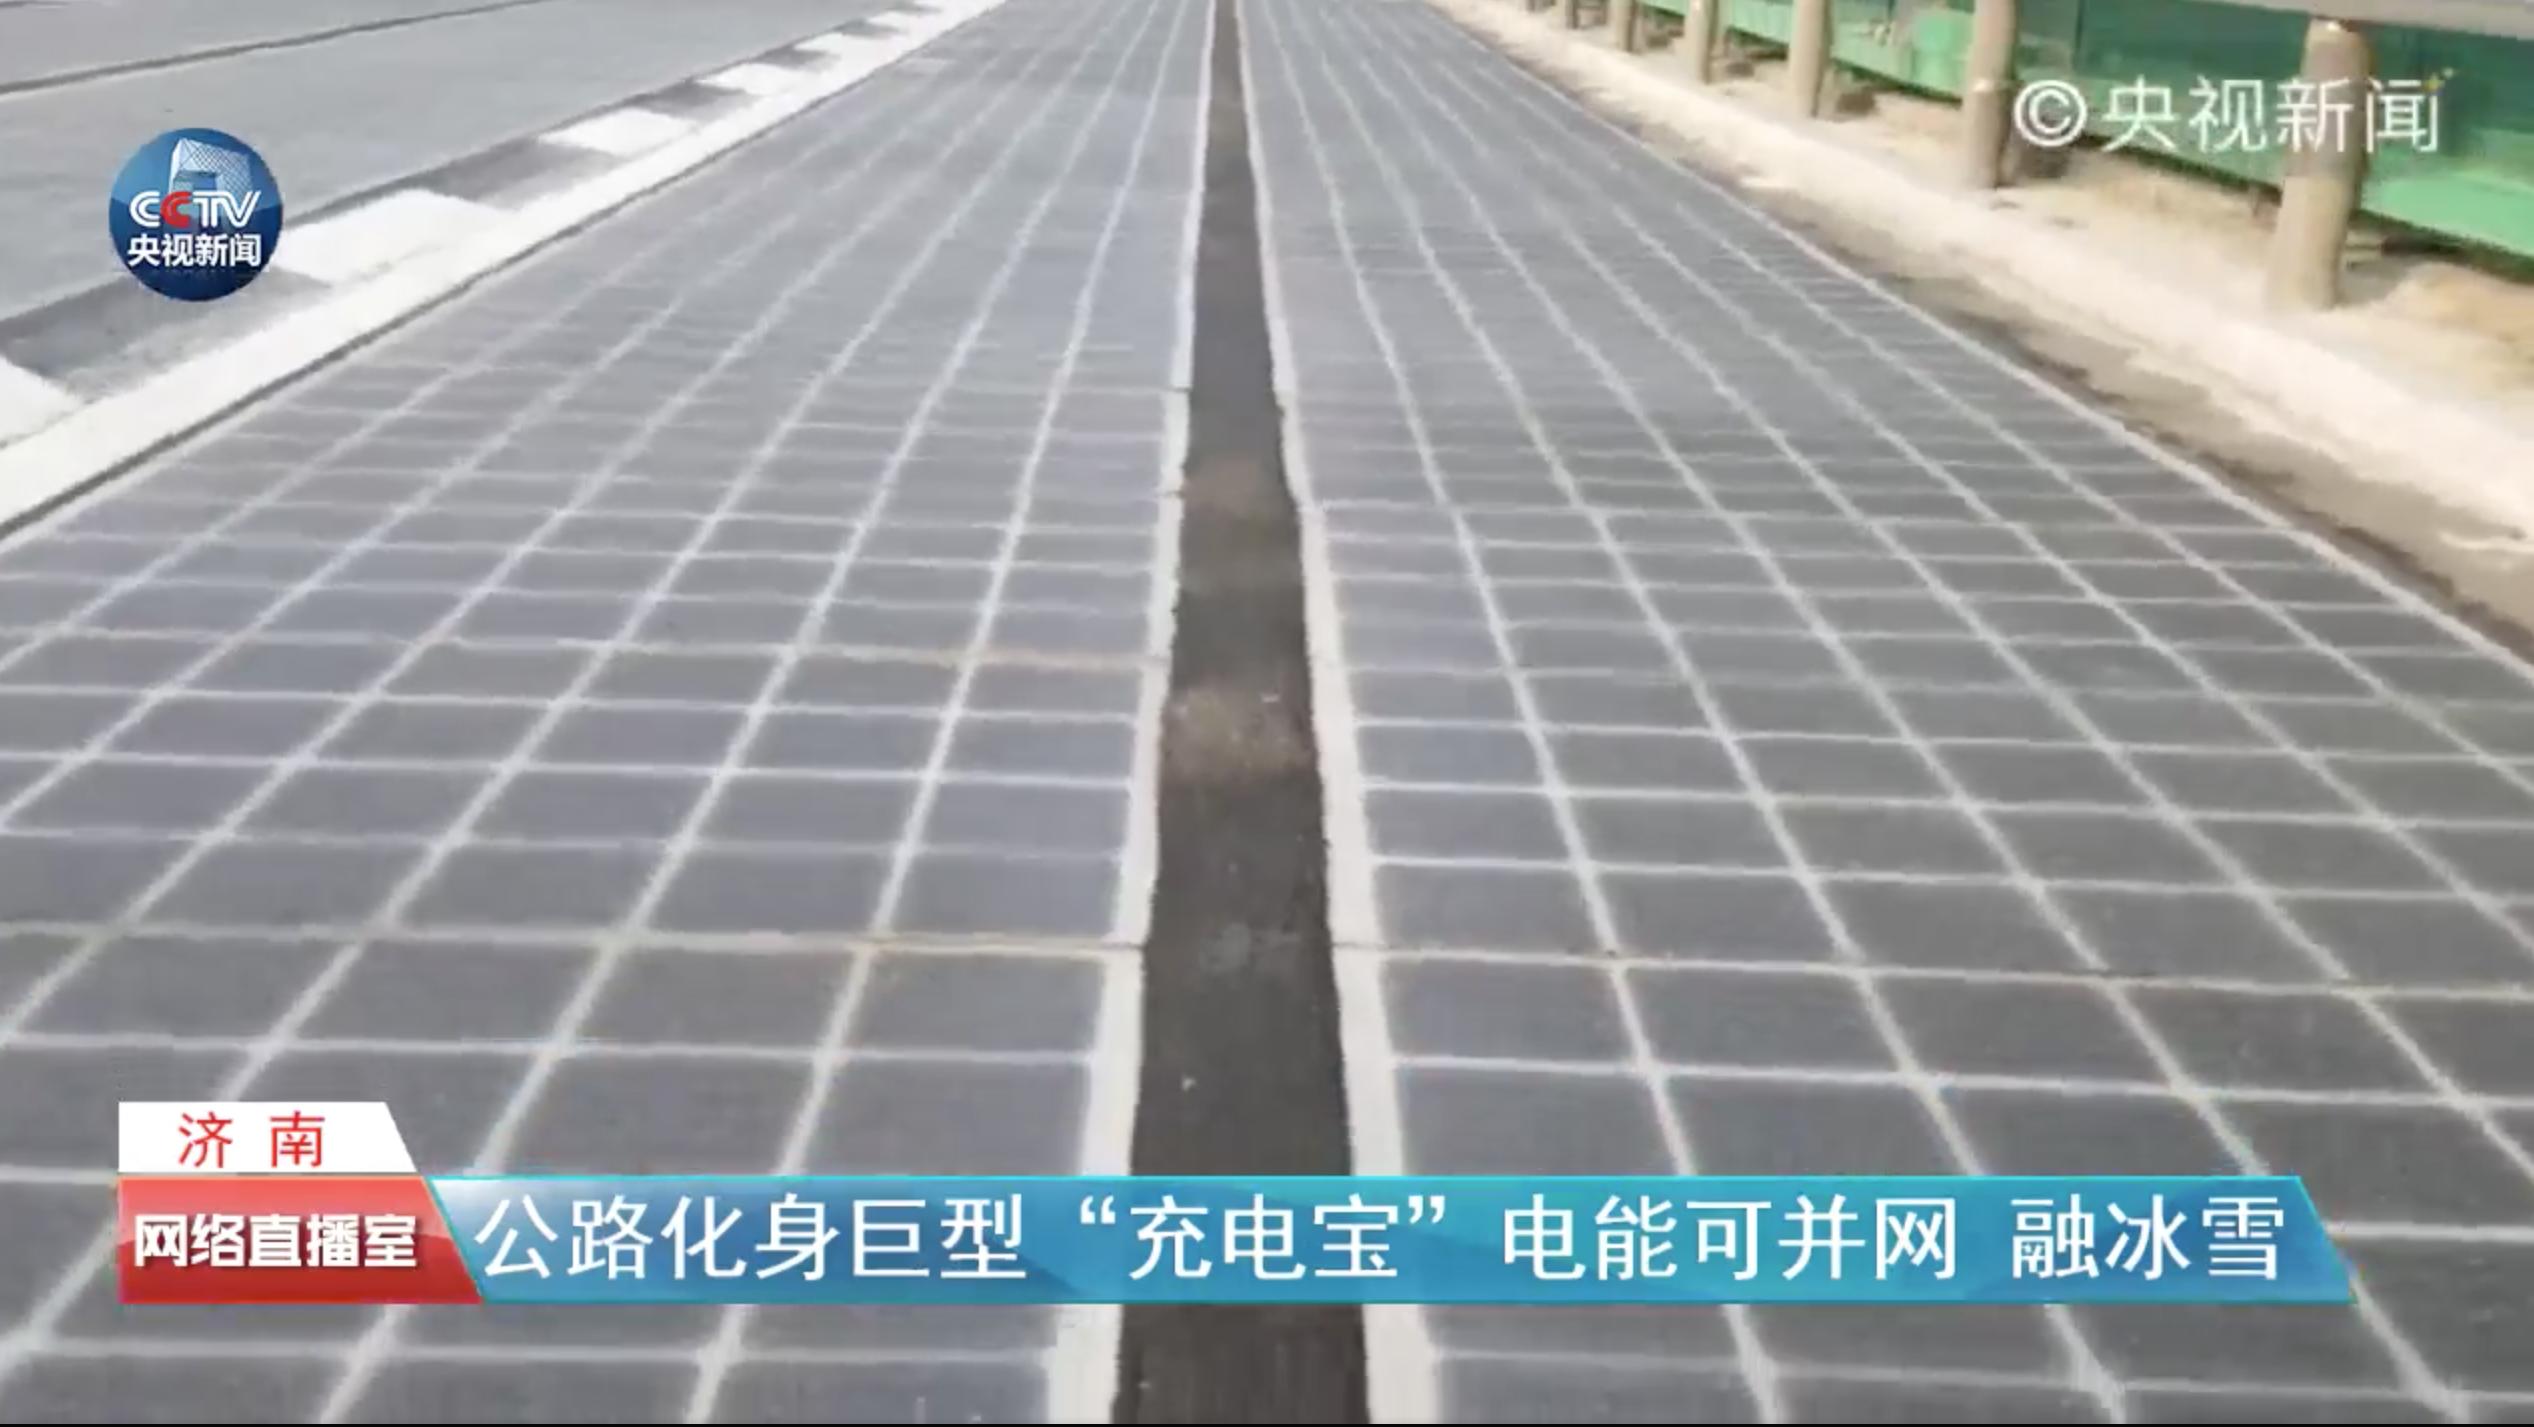 The solar power highway.